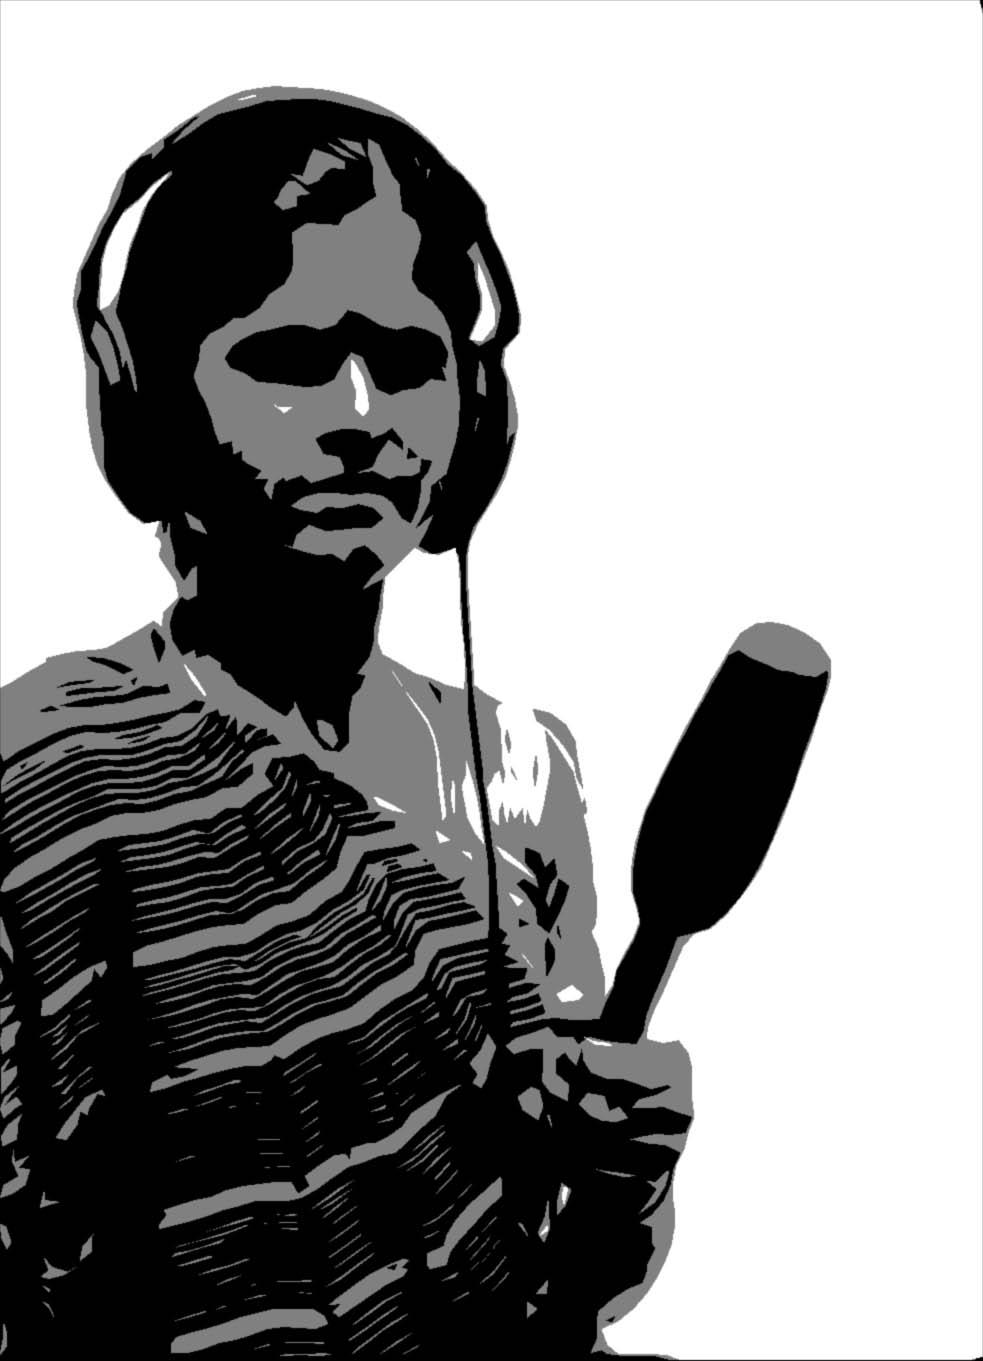 radiocaster_copy